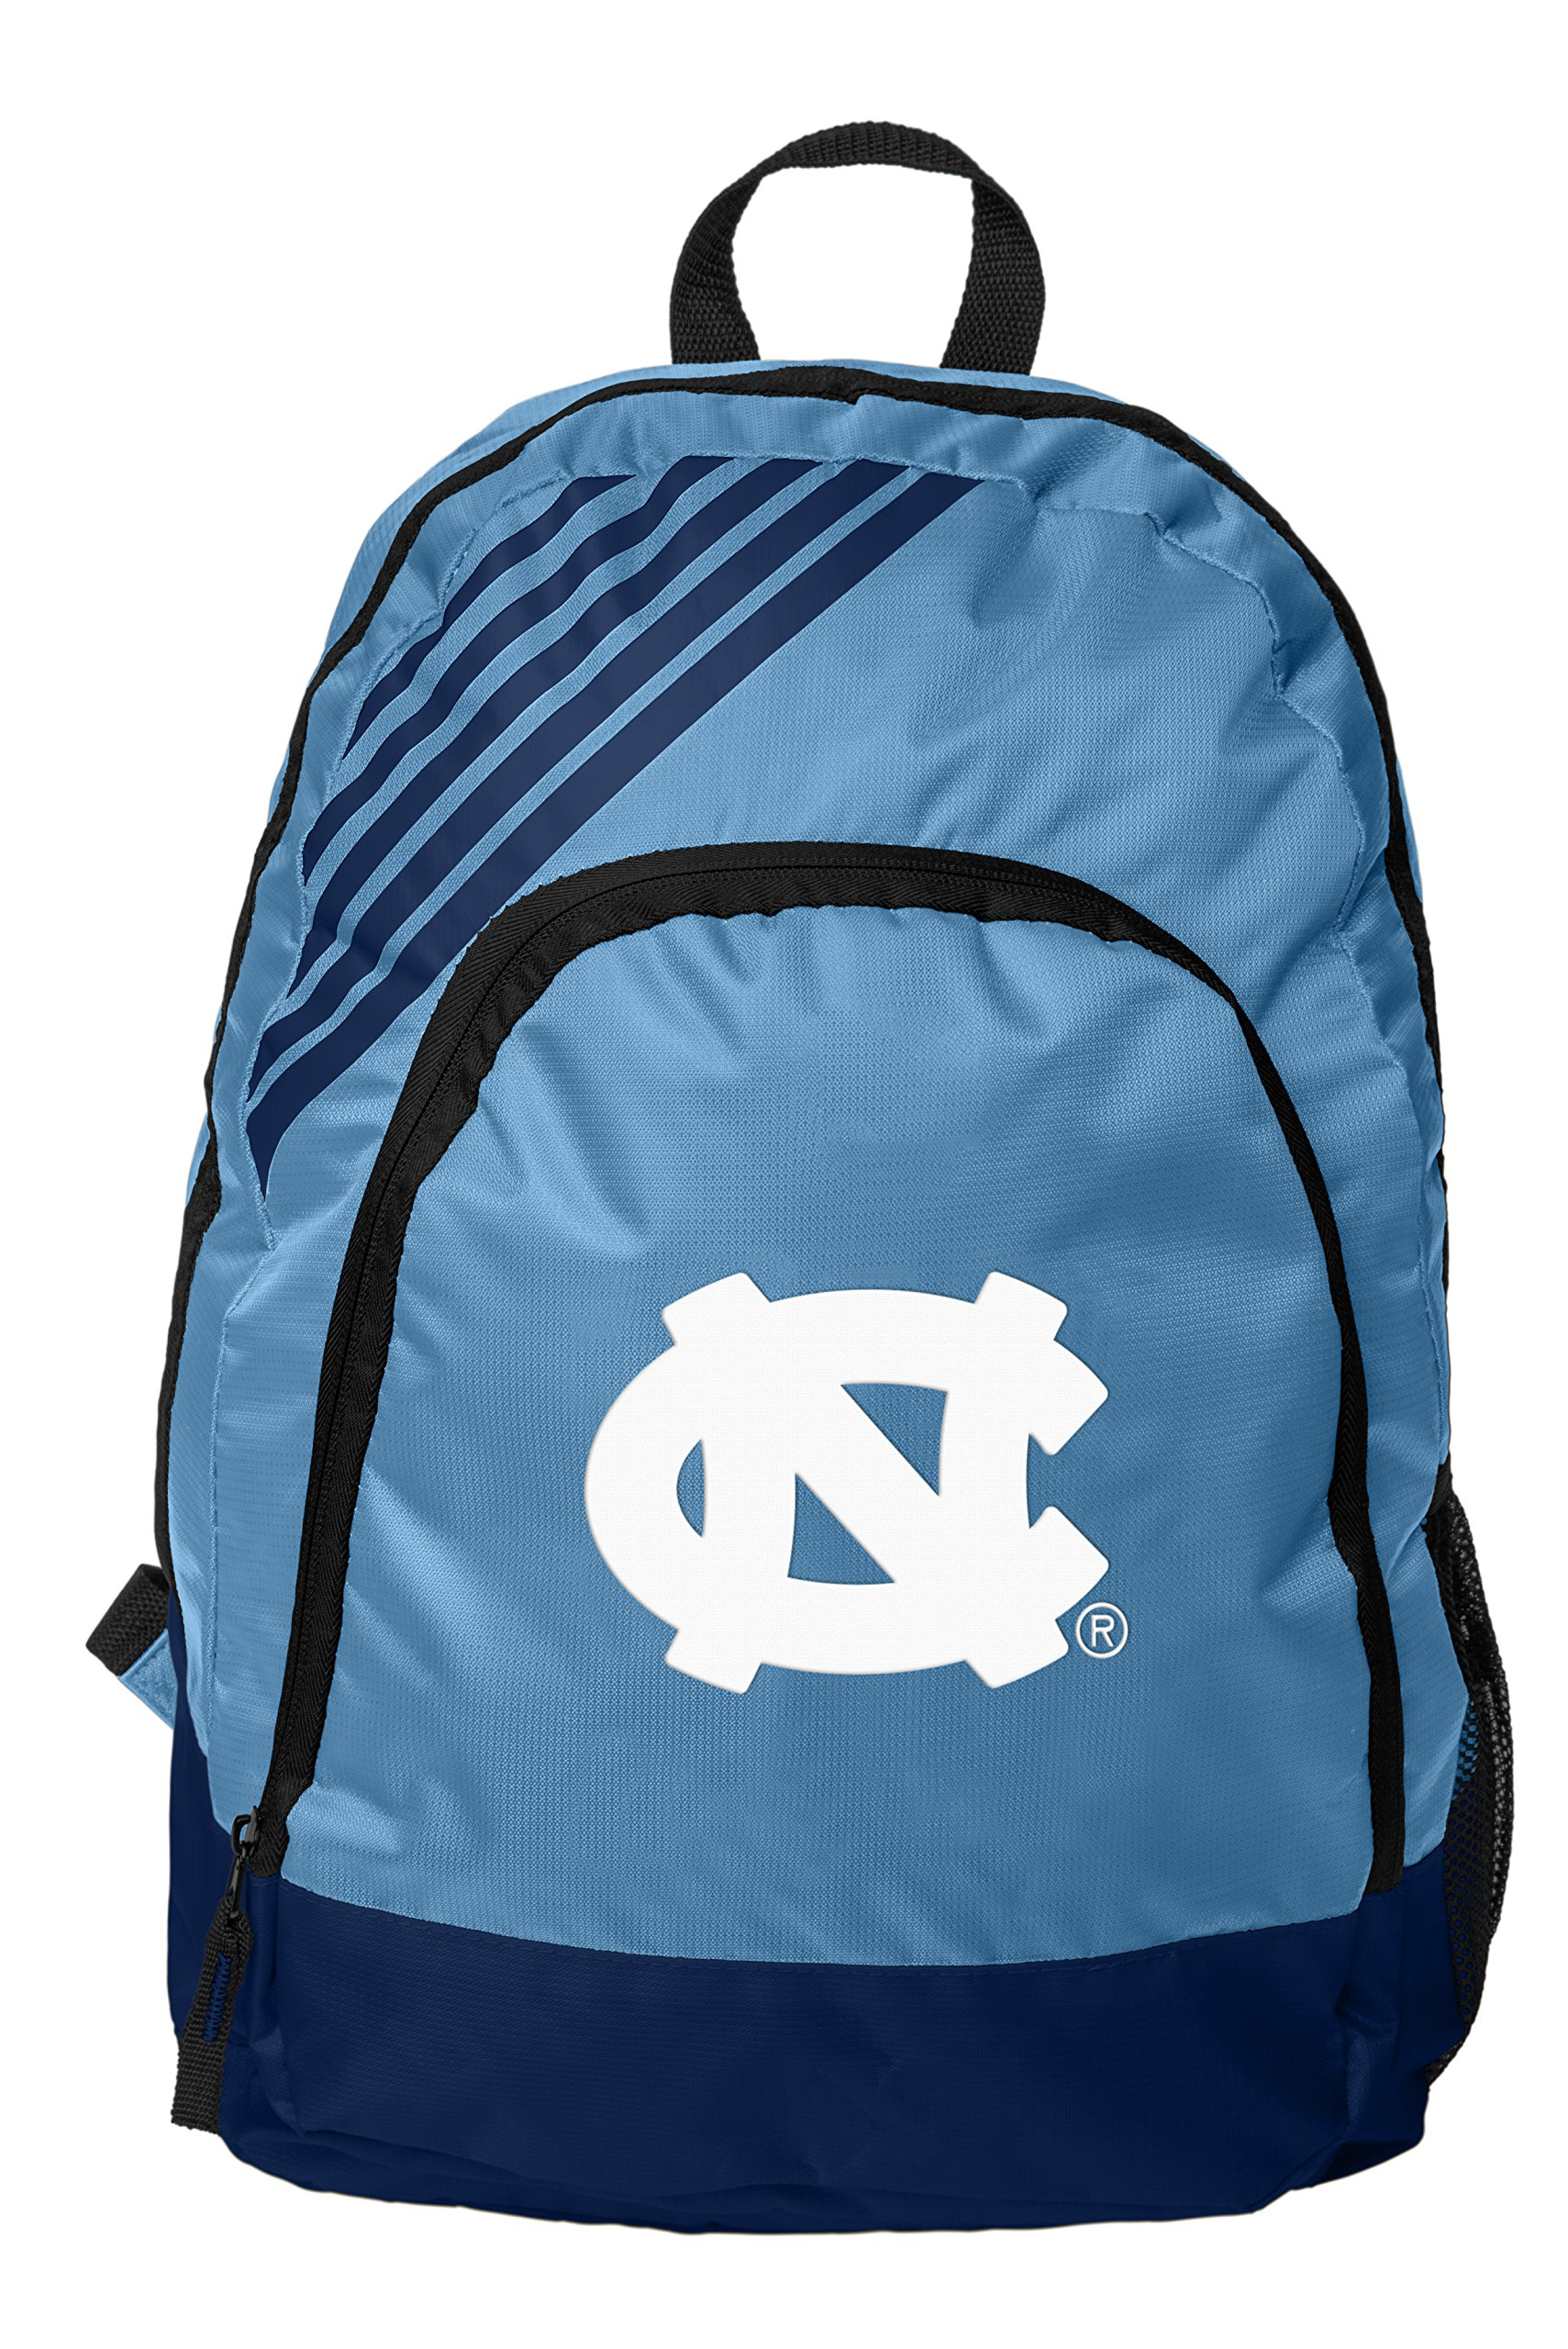 FOCO North Carolina Border Stripe Backpack